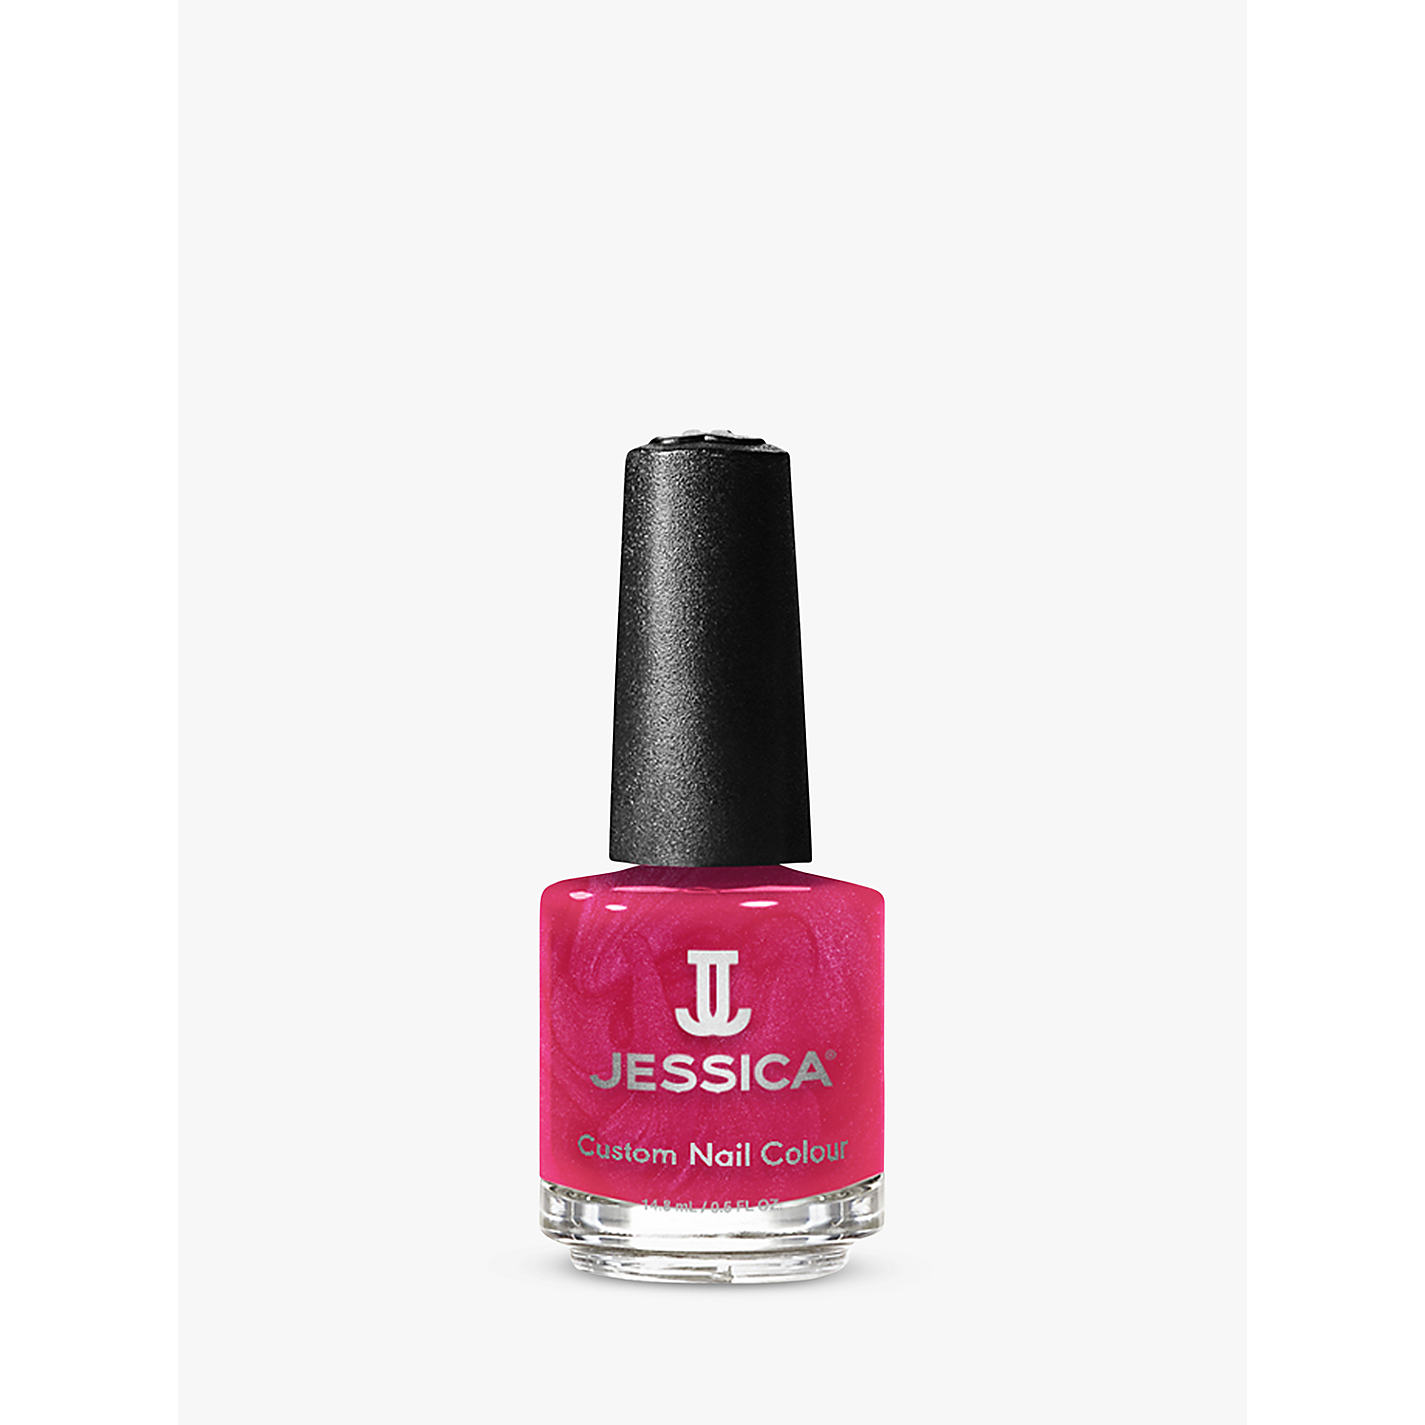 Popular fashion nails uxbridge - Buy Jessica Custom Nail Colour Pinks Online At Johnlewis Com